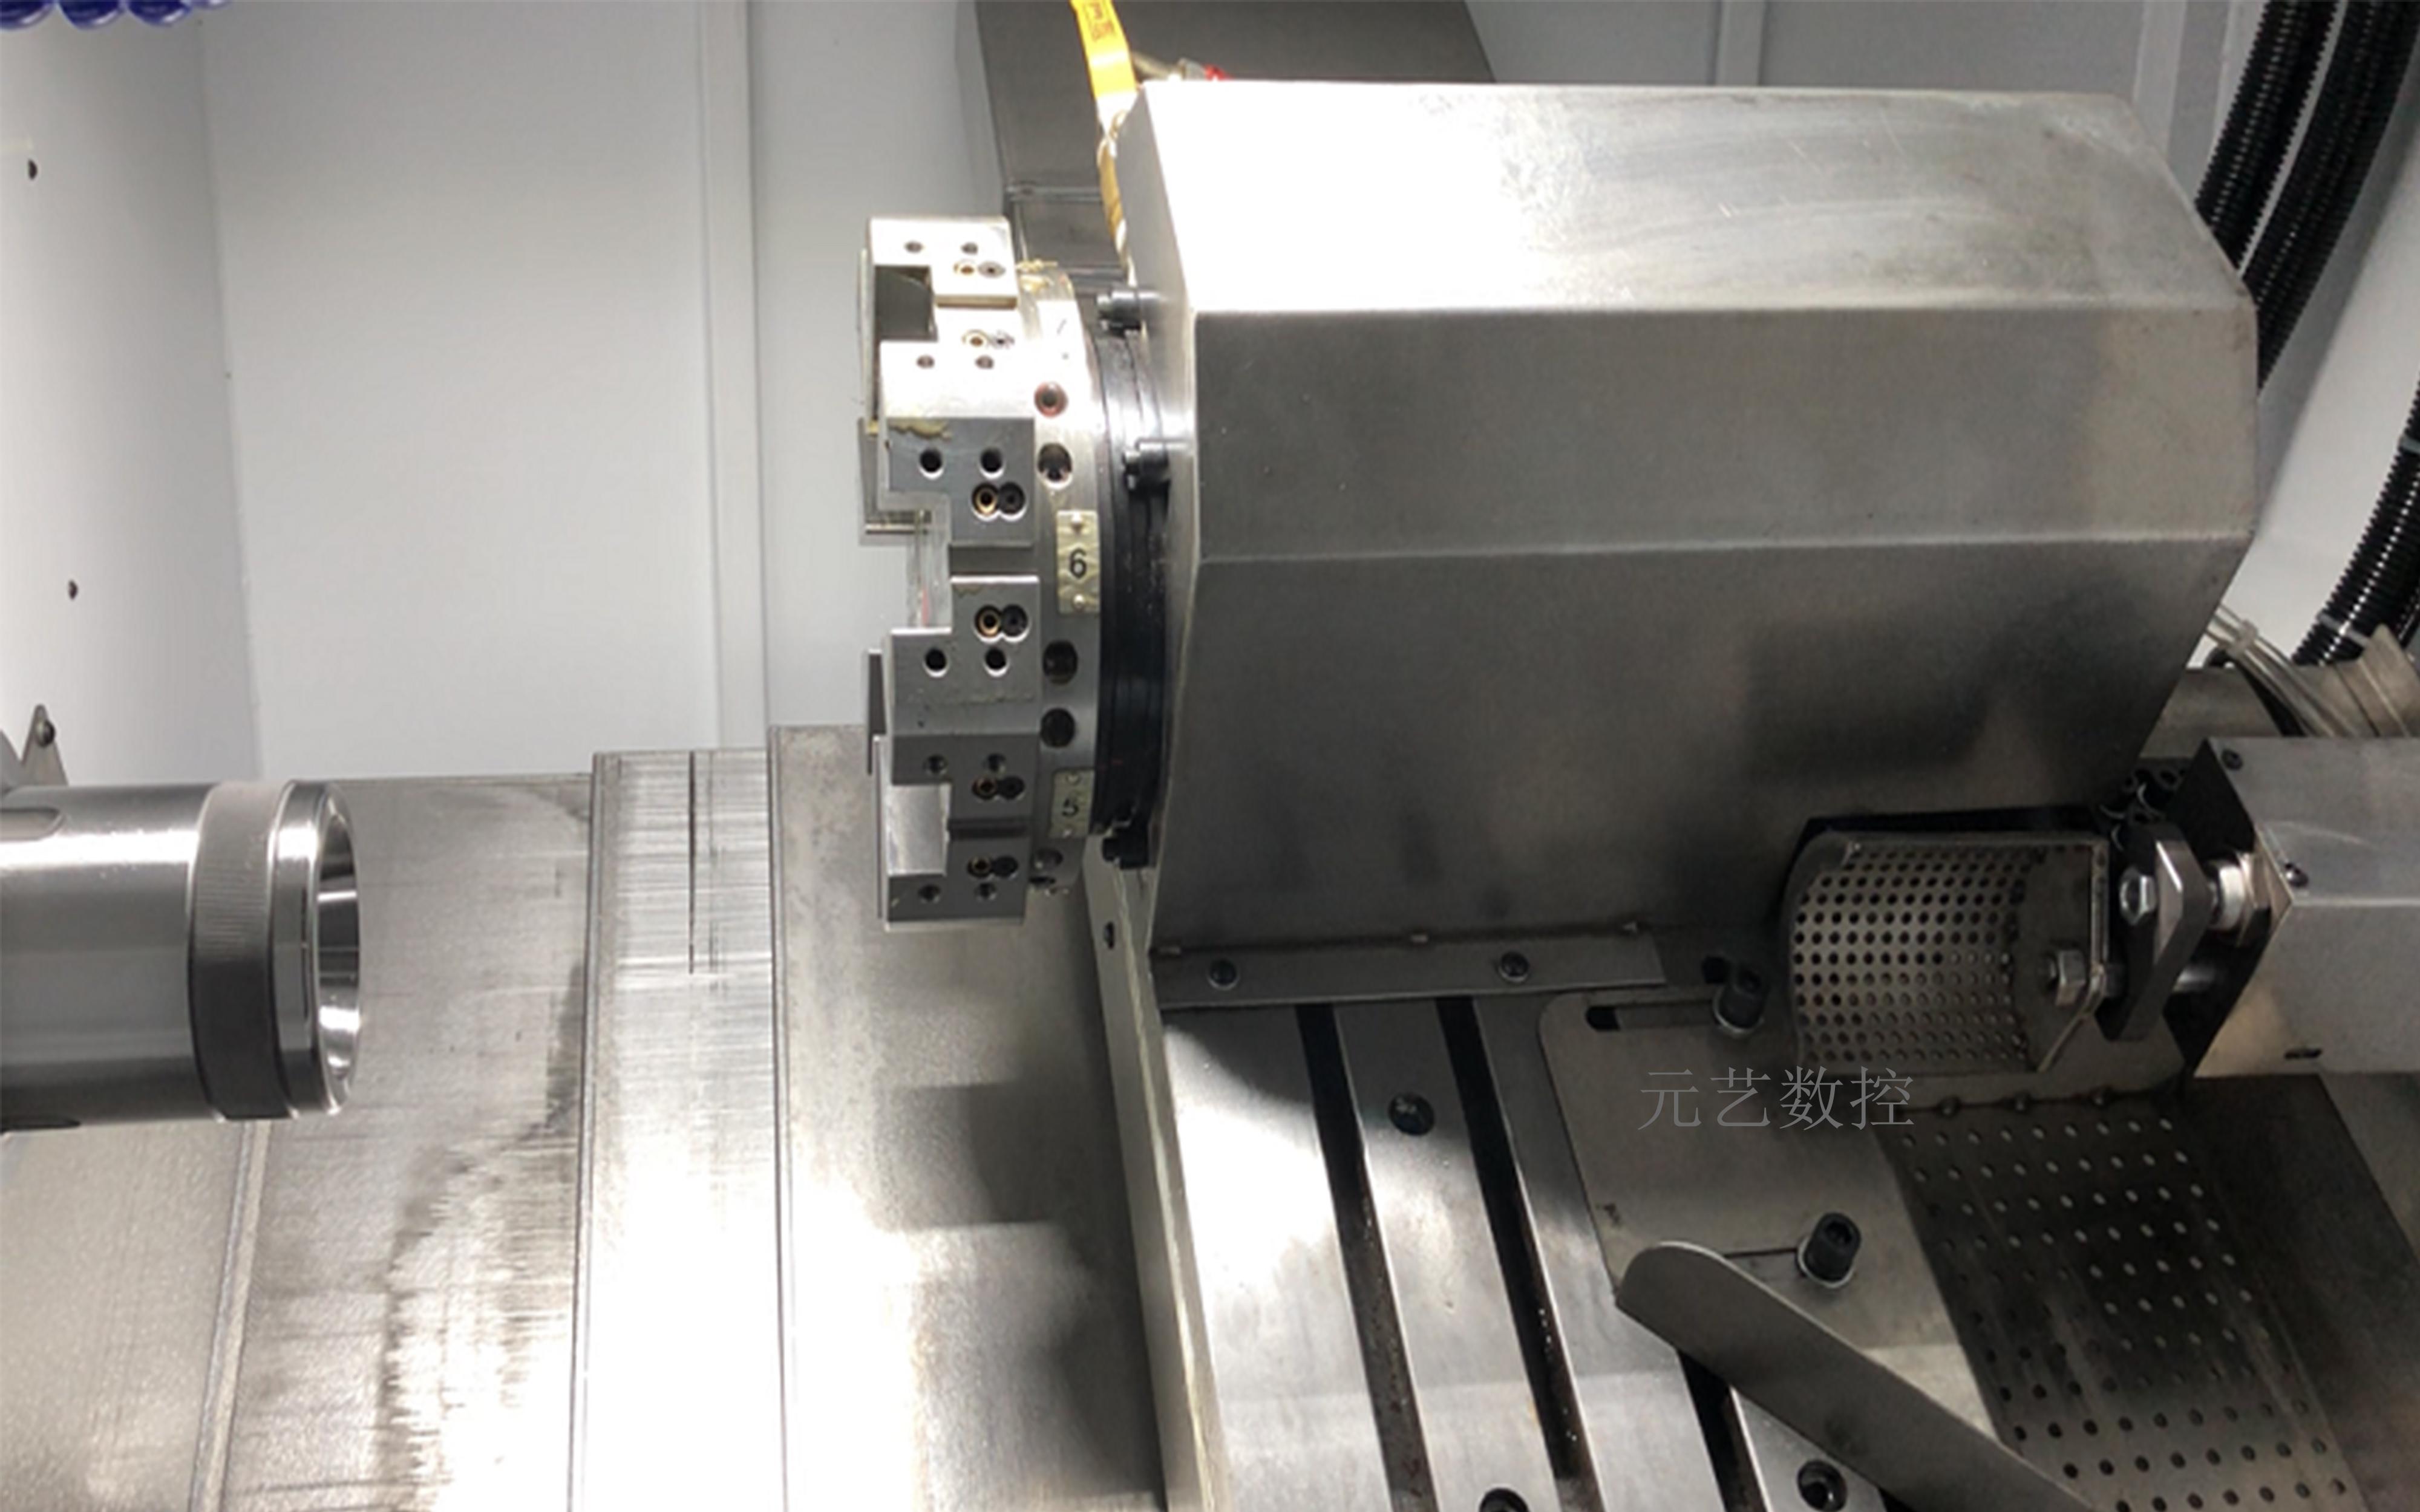 CK46X/D 刀塔斜軌精密數控車床(不帶尾頂)